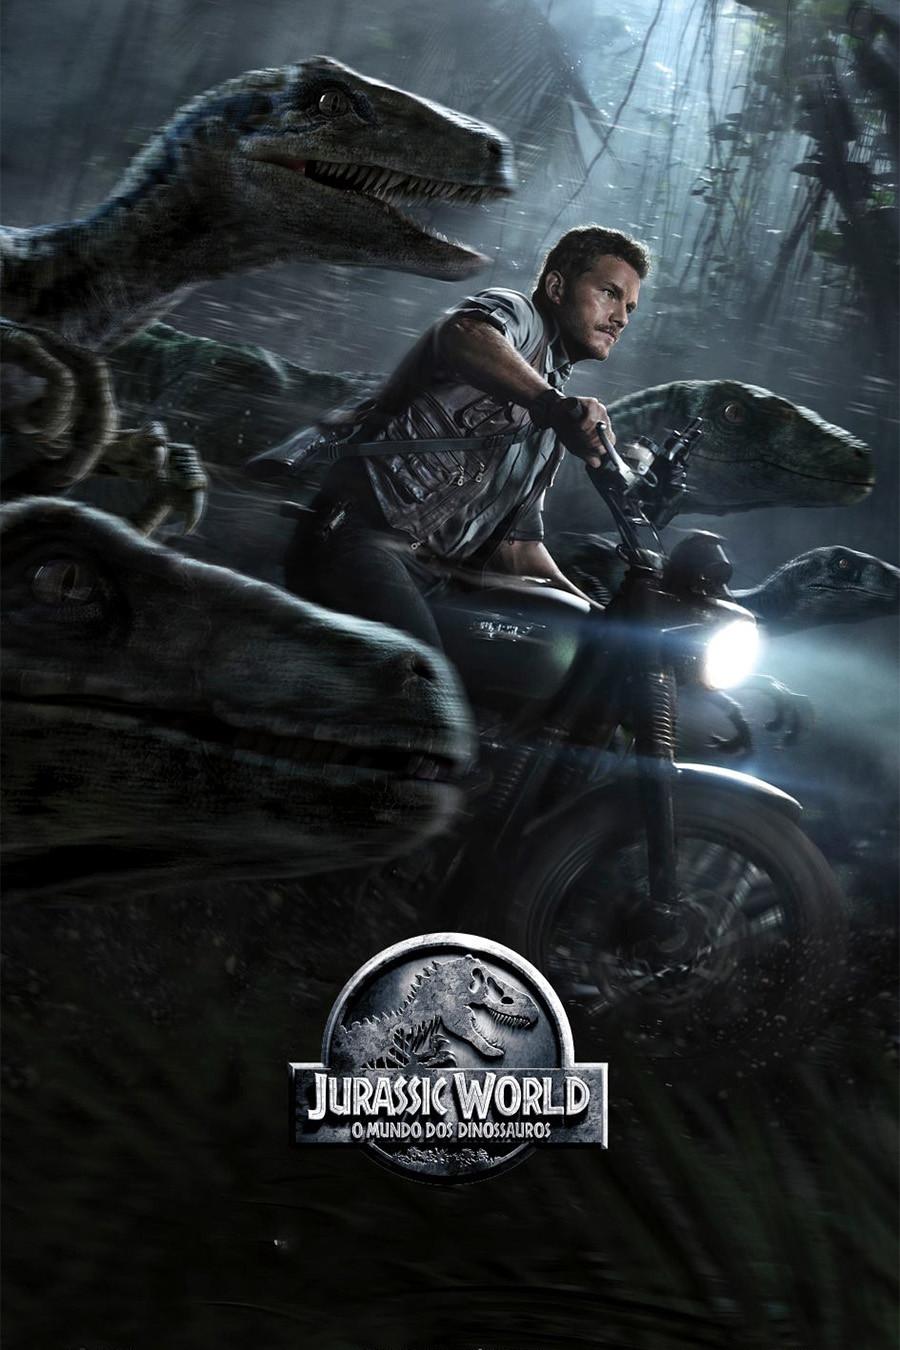 Jurassic World - O Mundo dos Dinossauros (Jurassic World: 2015)